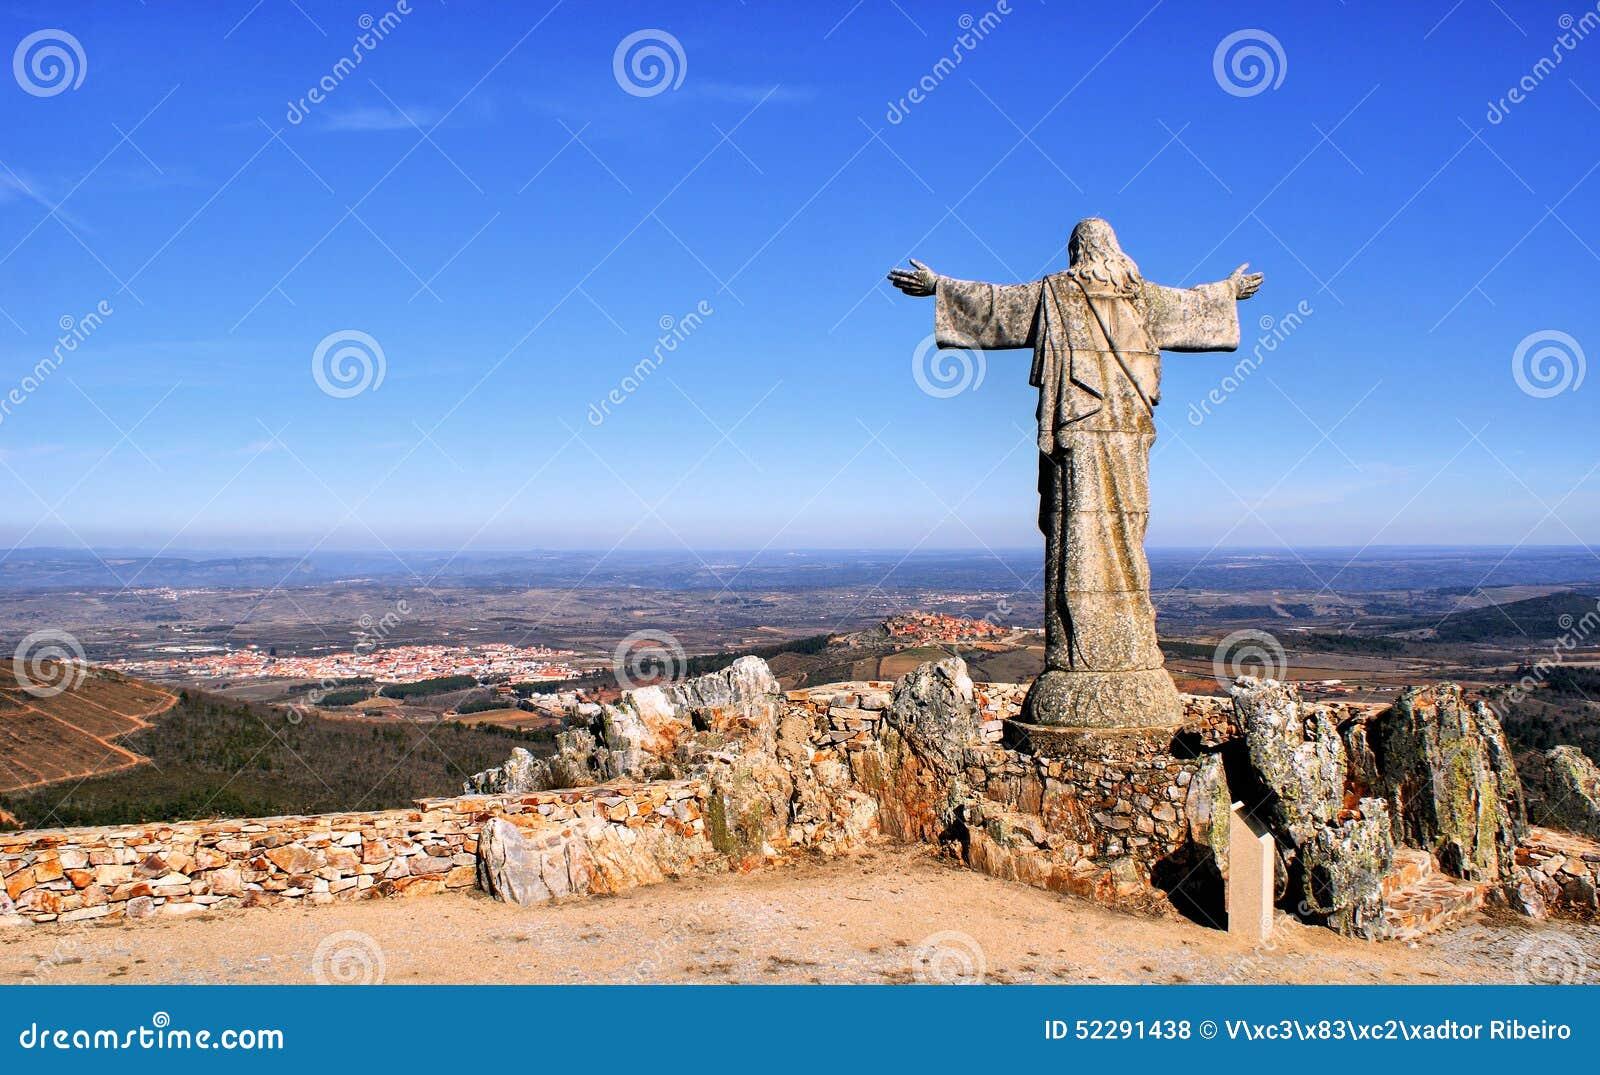 Download Panorama Of Sierra Marofa In Figueira De Castelo Rodrigo Stock Photo - Image of statue, mountains: 52291438